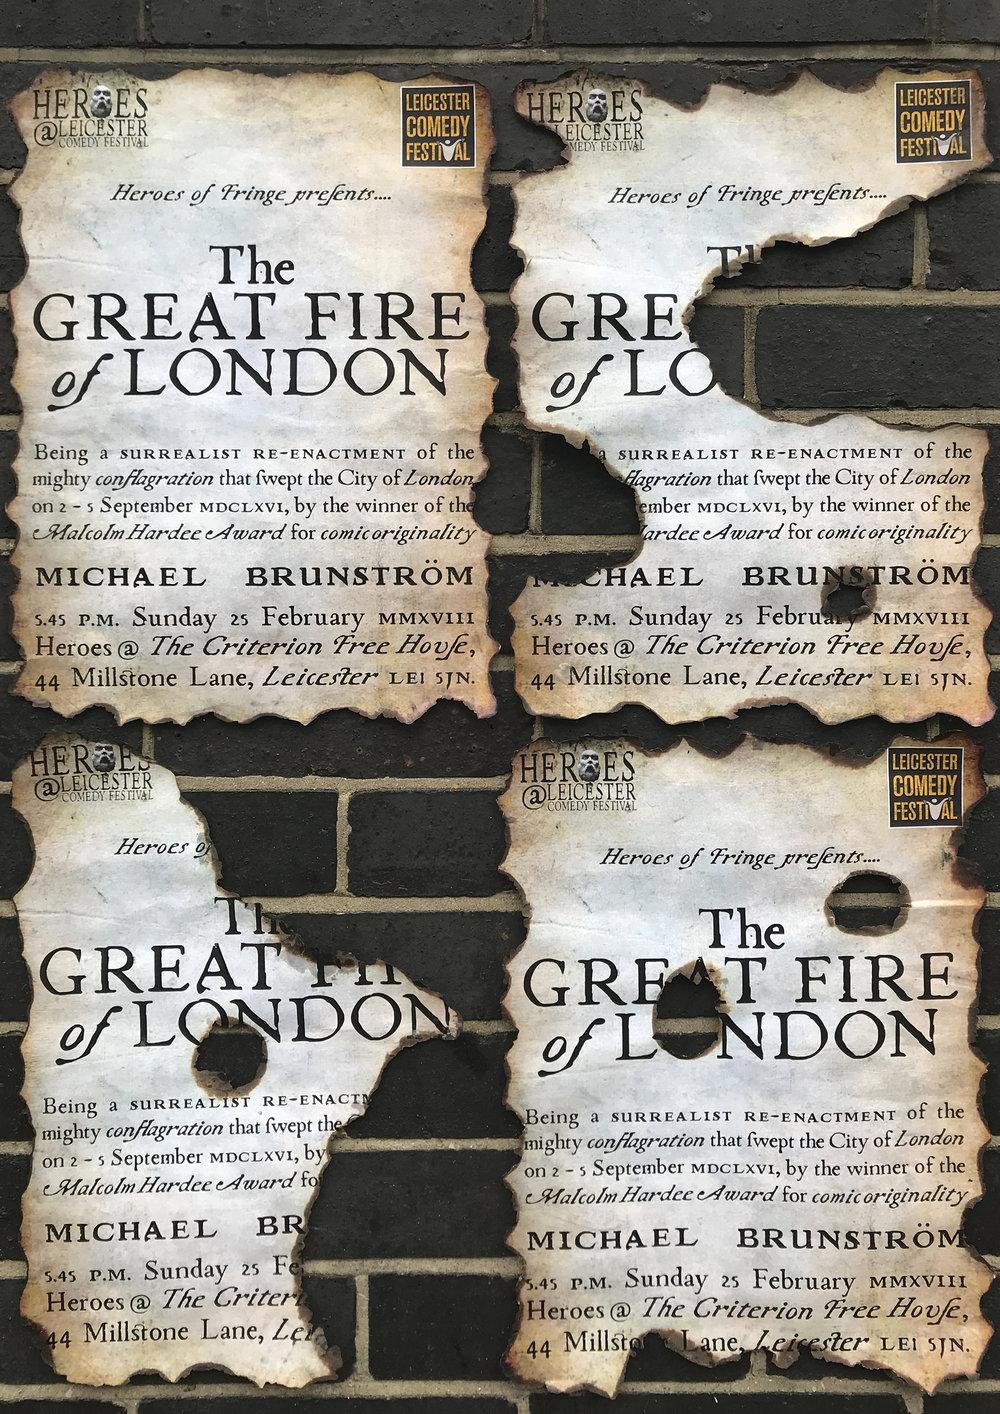 Michael Brunstrom Great Fire of London POSTER.jpg